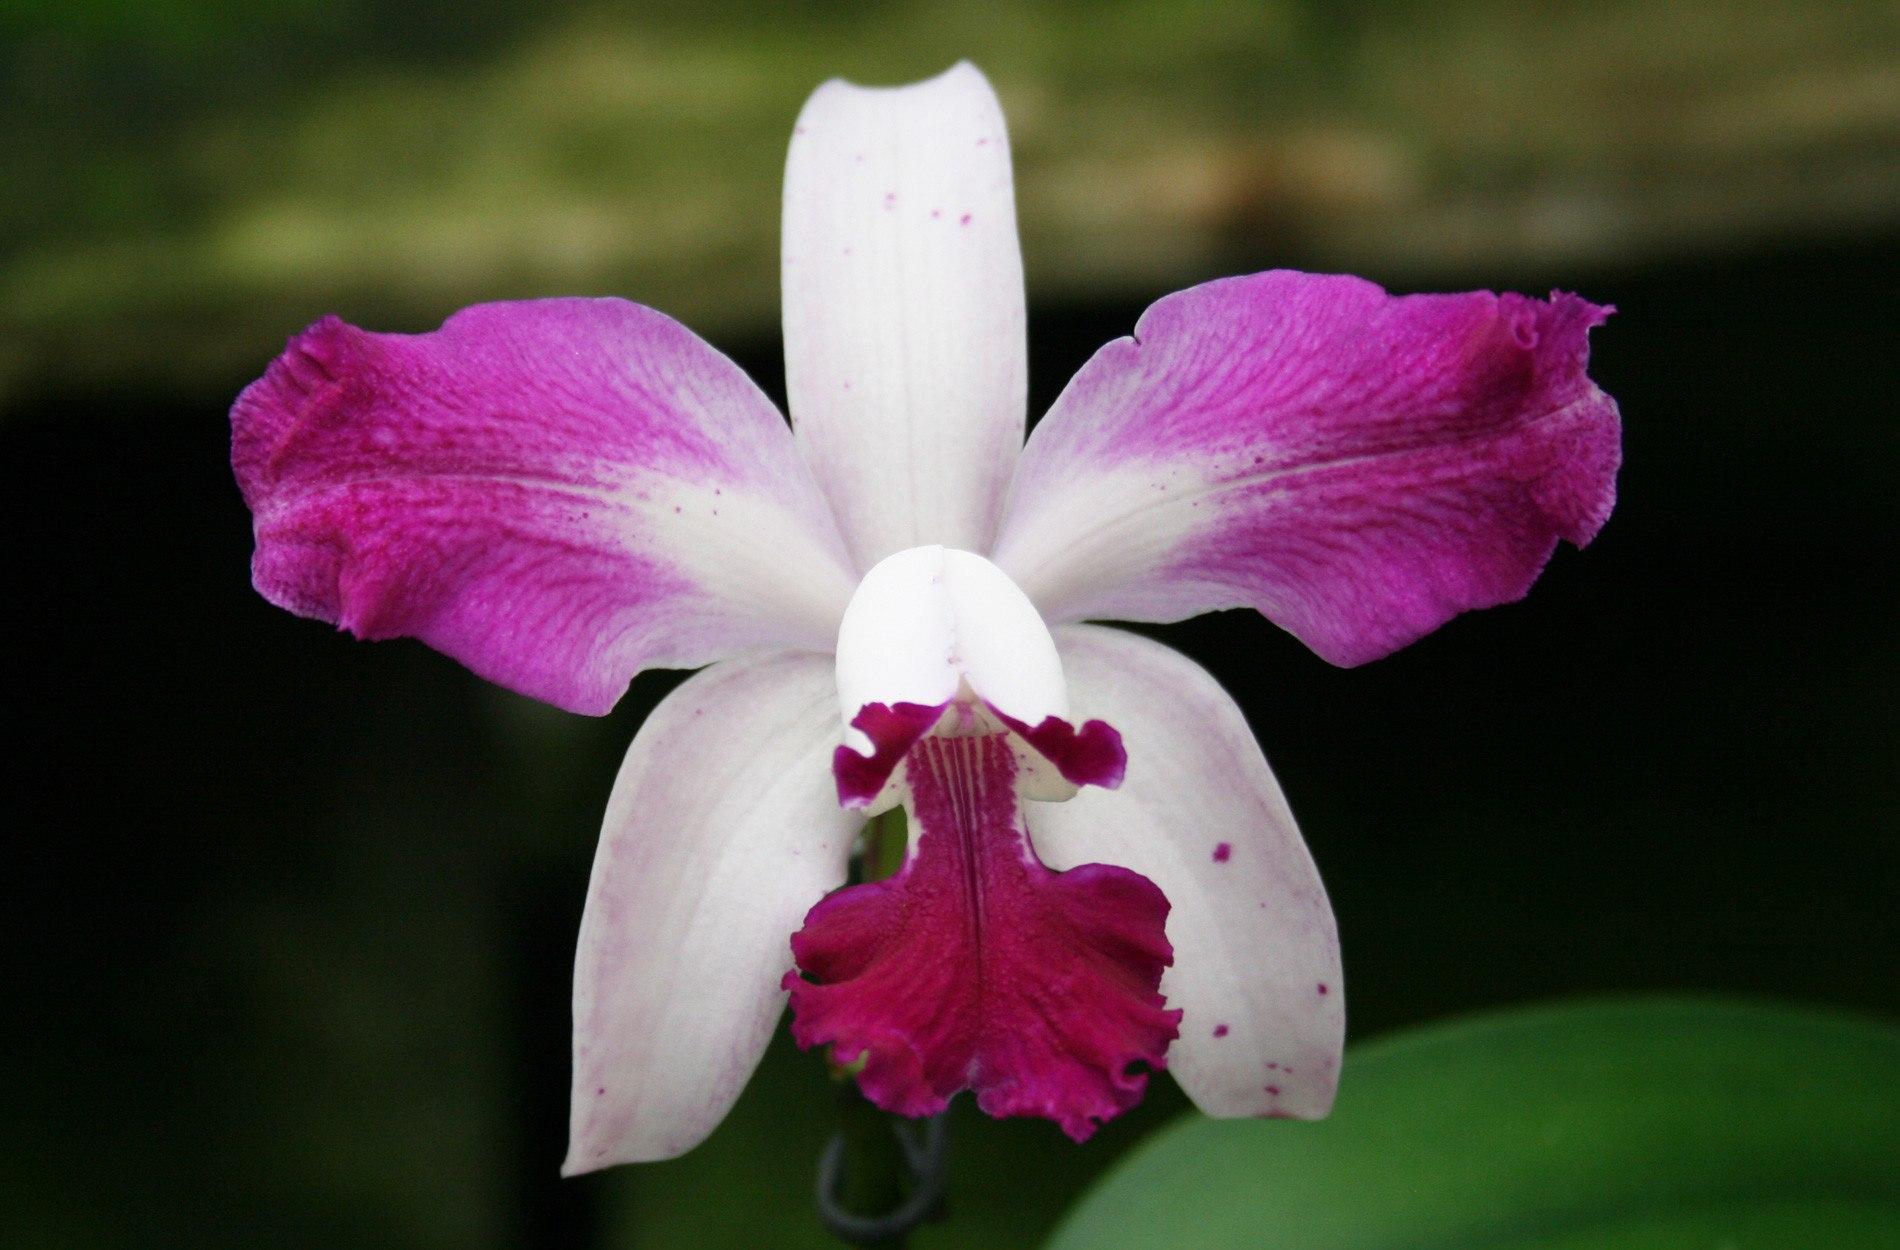 Petrens Orchid Shop, http://www.petrensorchidshop.eu/products/cattleya-interglossa